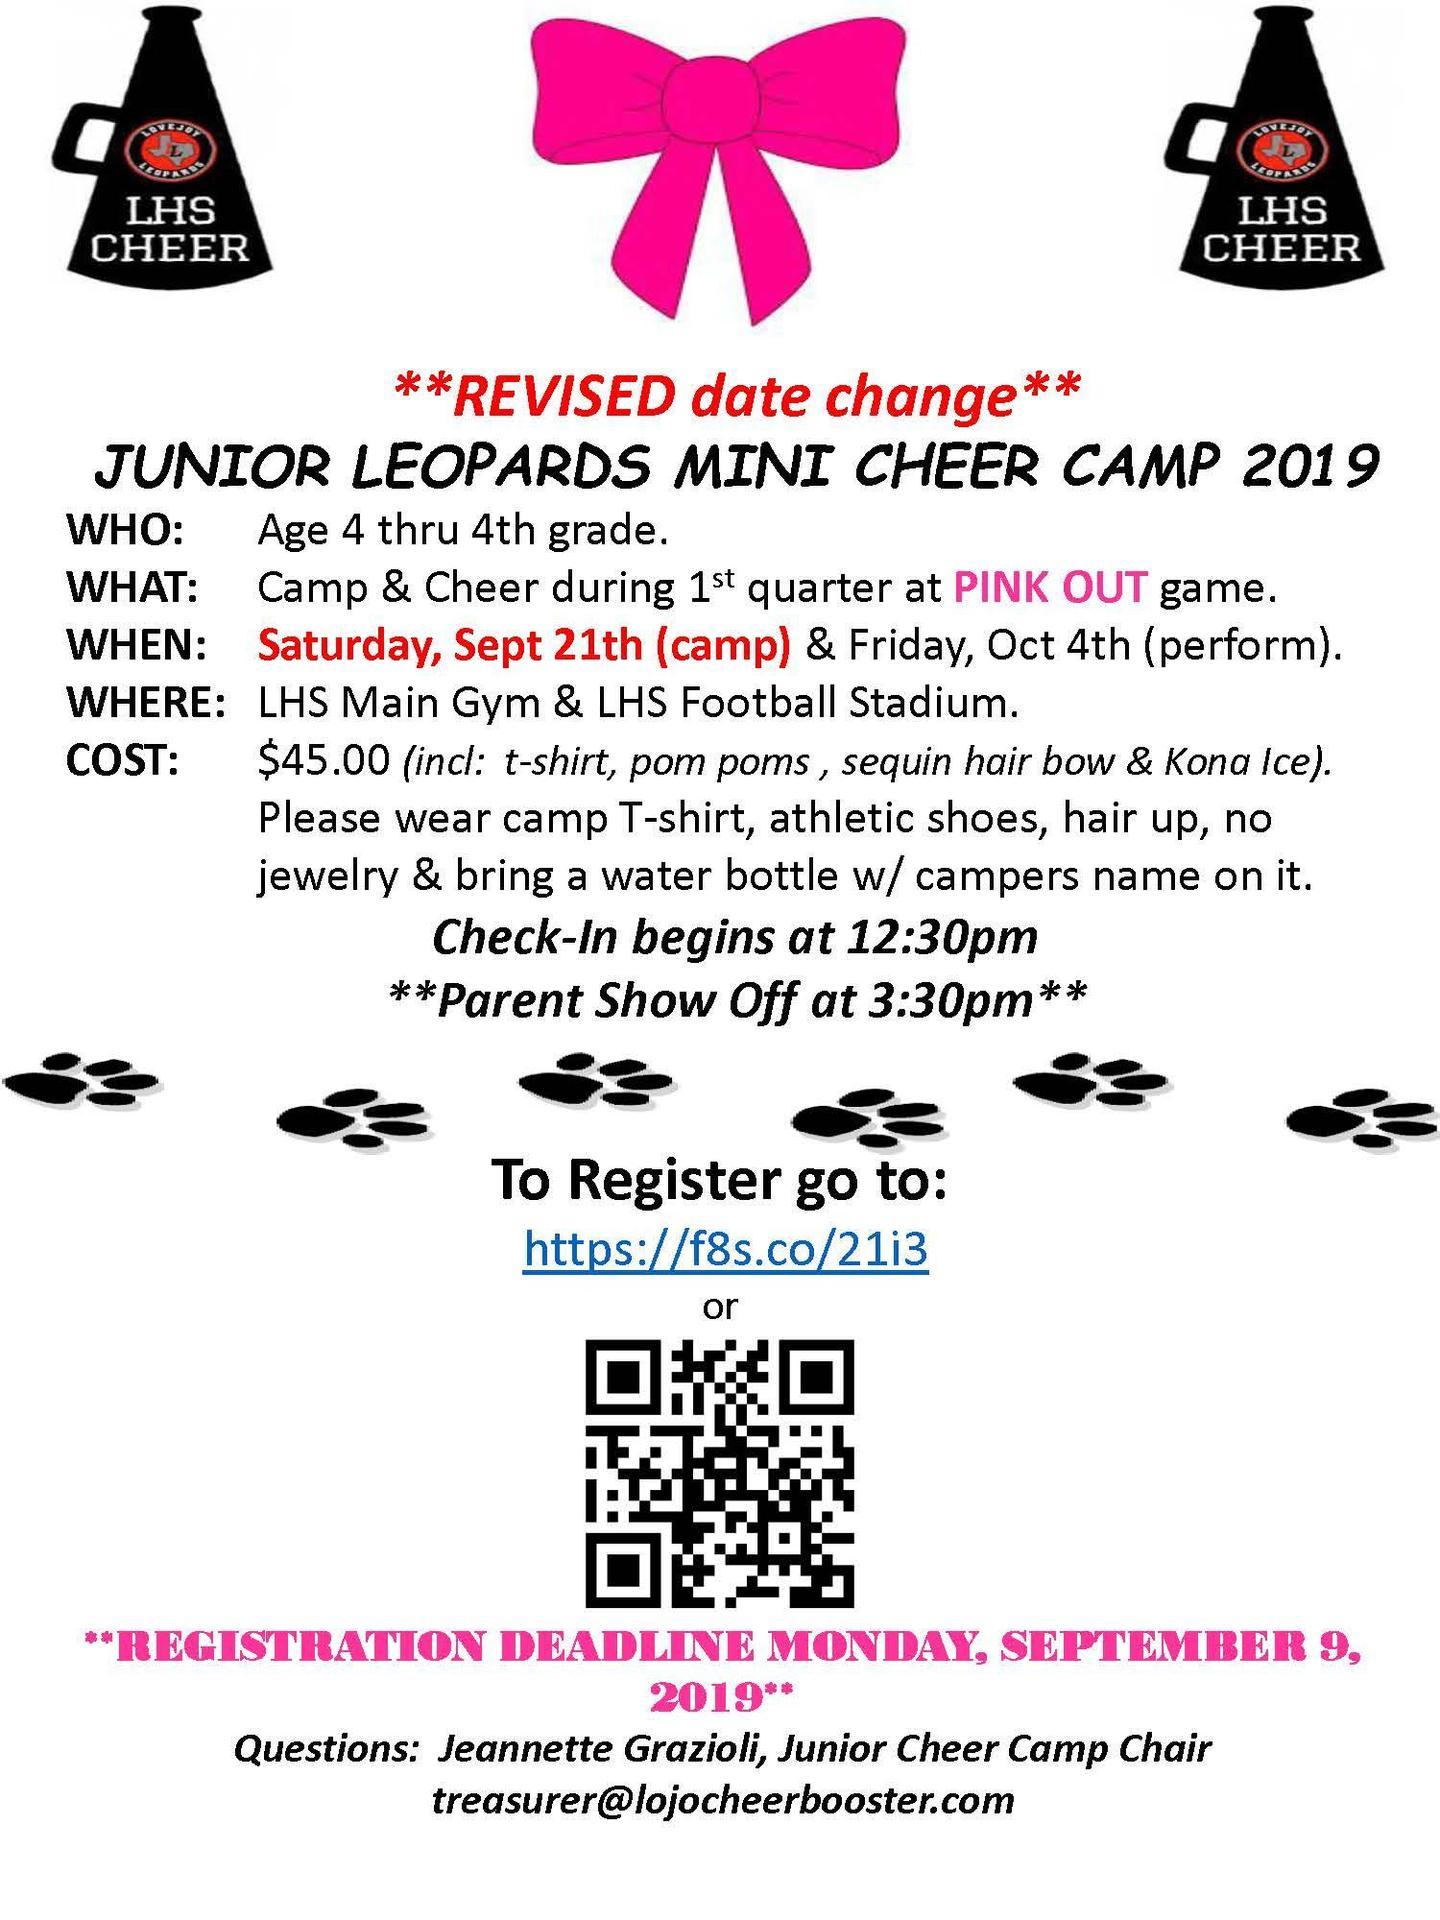 Junior Cheer Camp